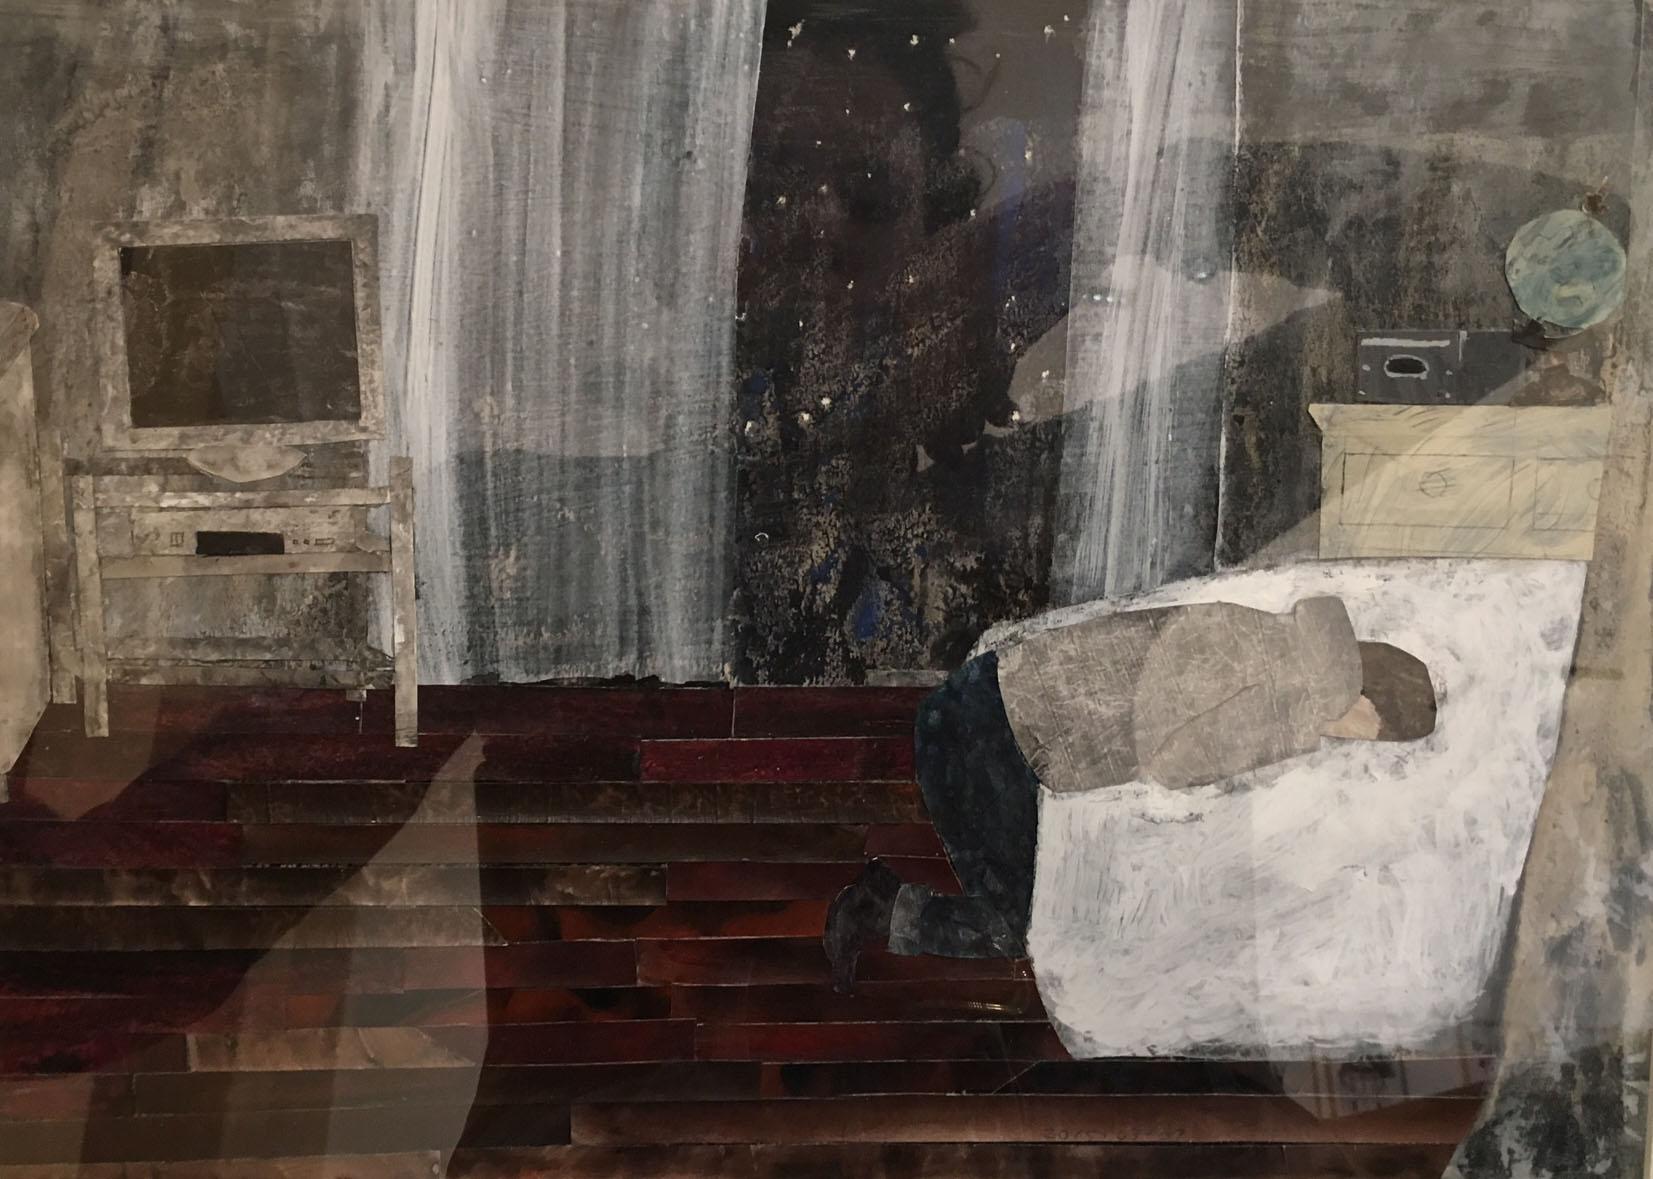 The night   GALERIE TREIZE-DIX I AUTRE JE   Yuki Kitazumi / The night